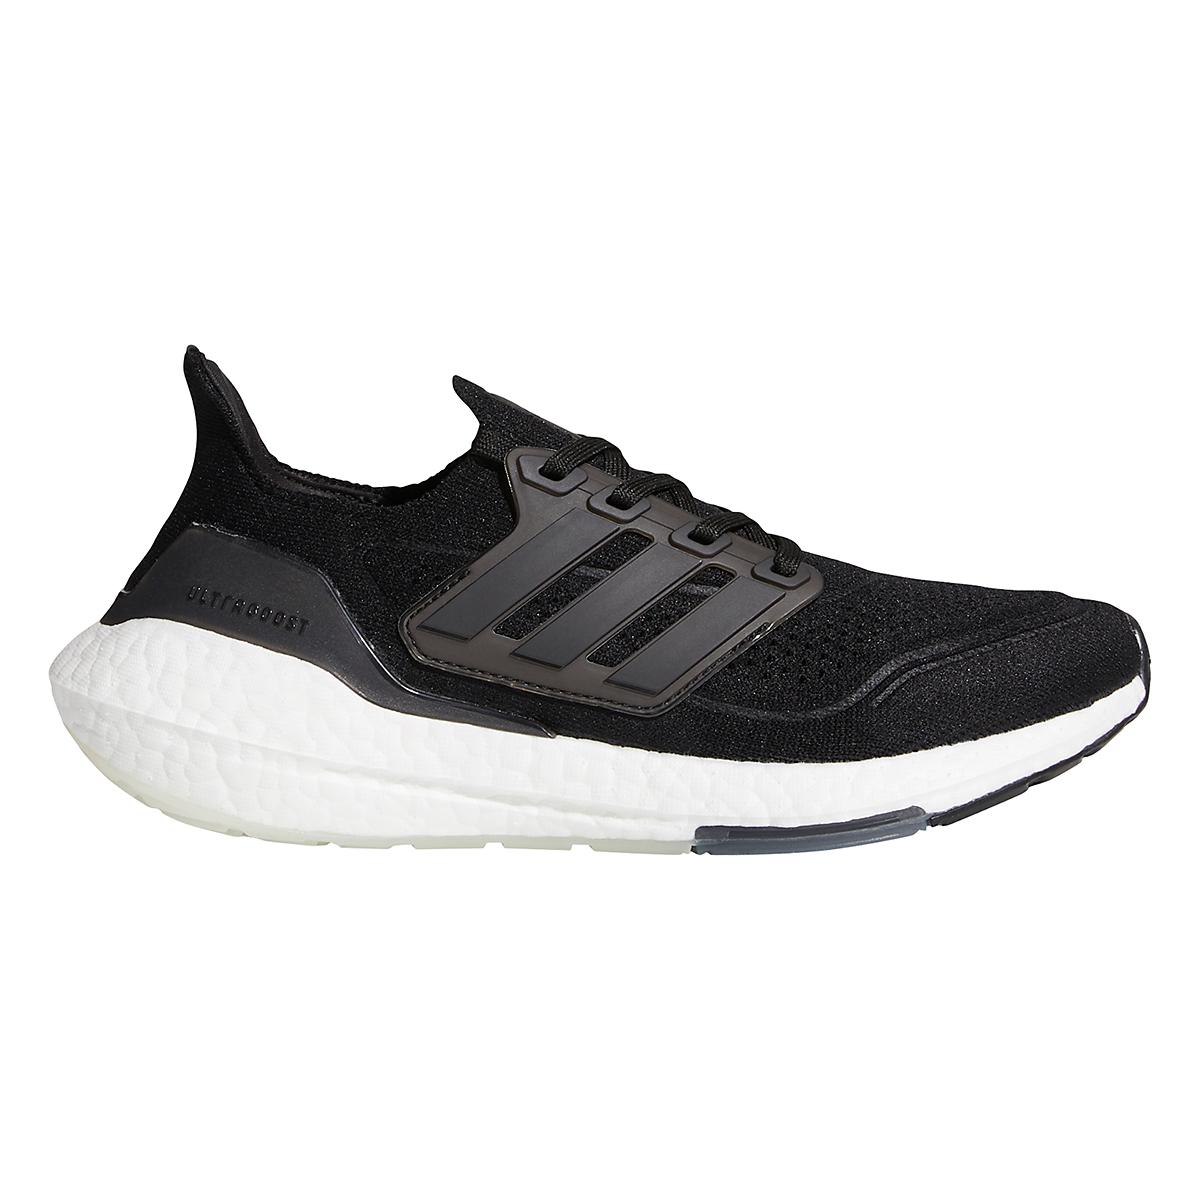 Women's Adidas Ultraboost 21 Running Shoe - Color: Core Black/Grey - Size: 5 - Width: Regular, Core Black/Grey, large, image 1